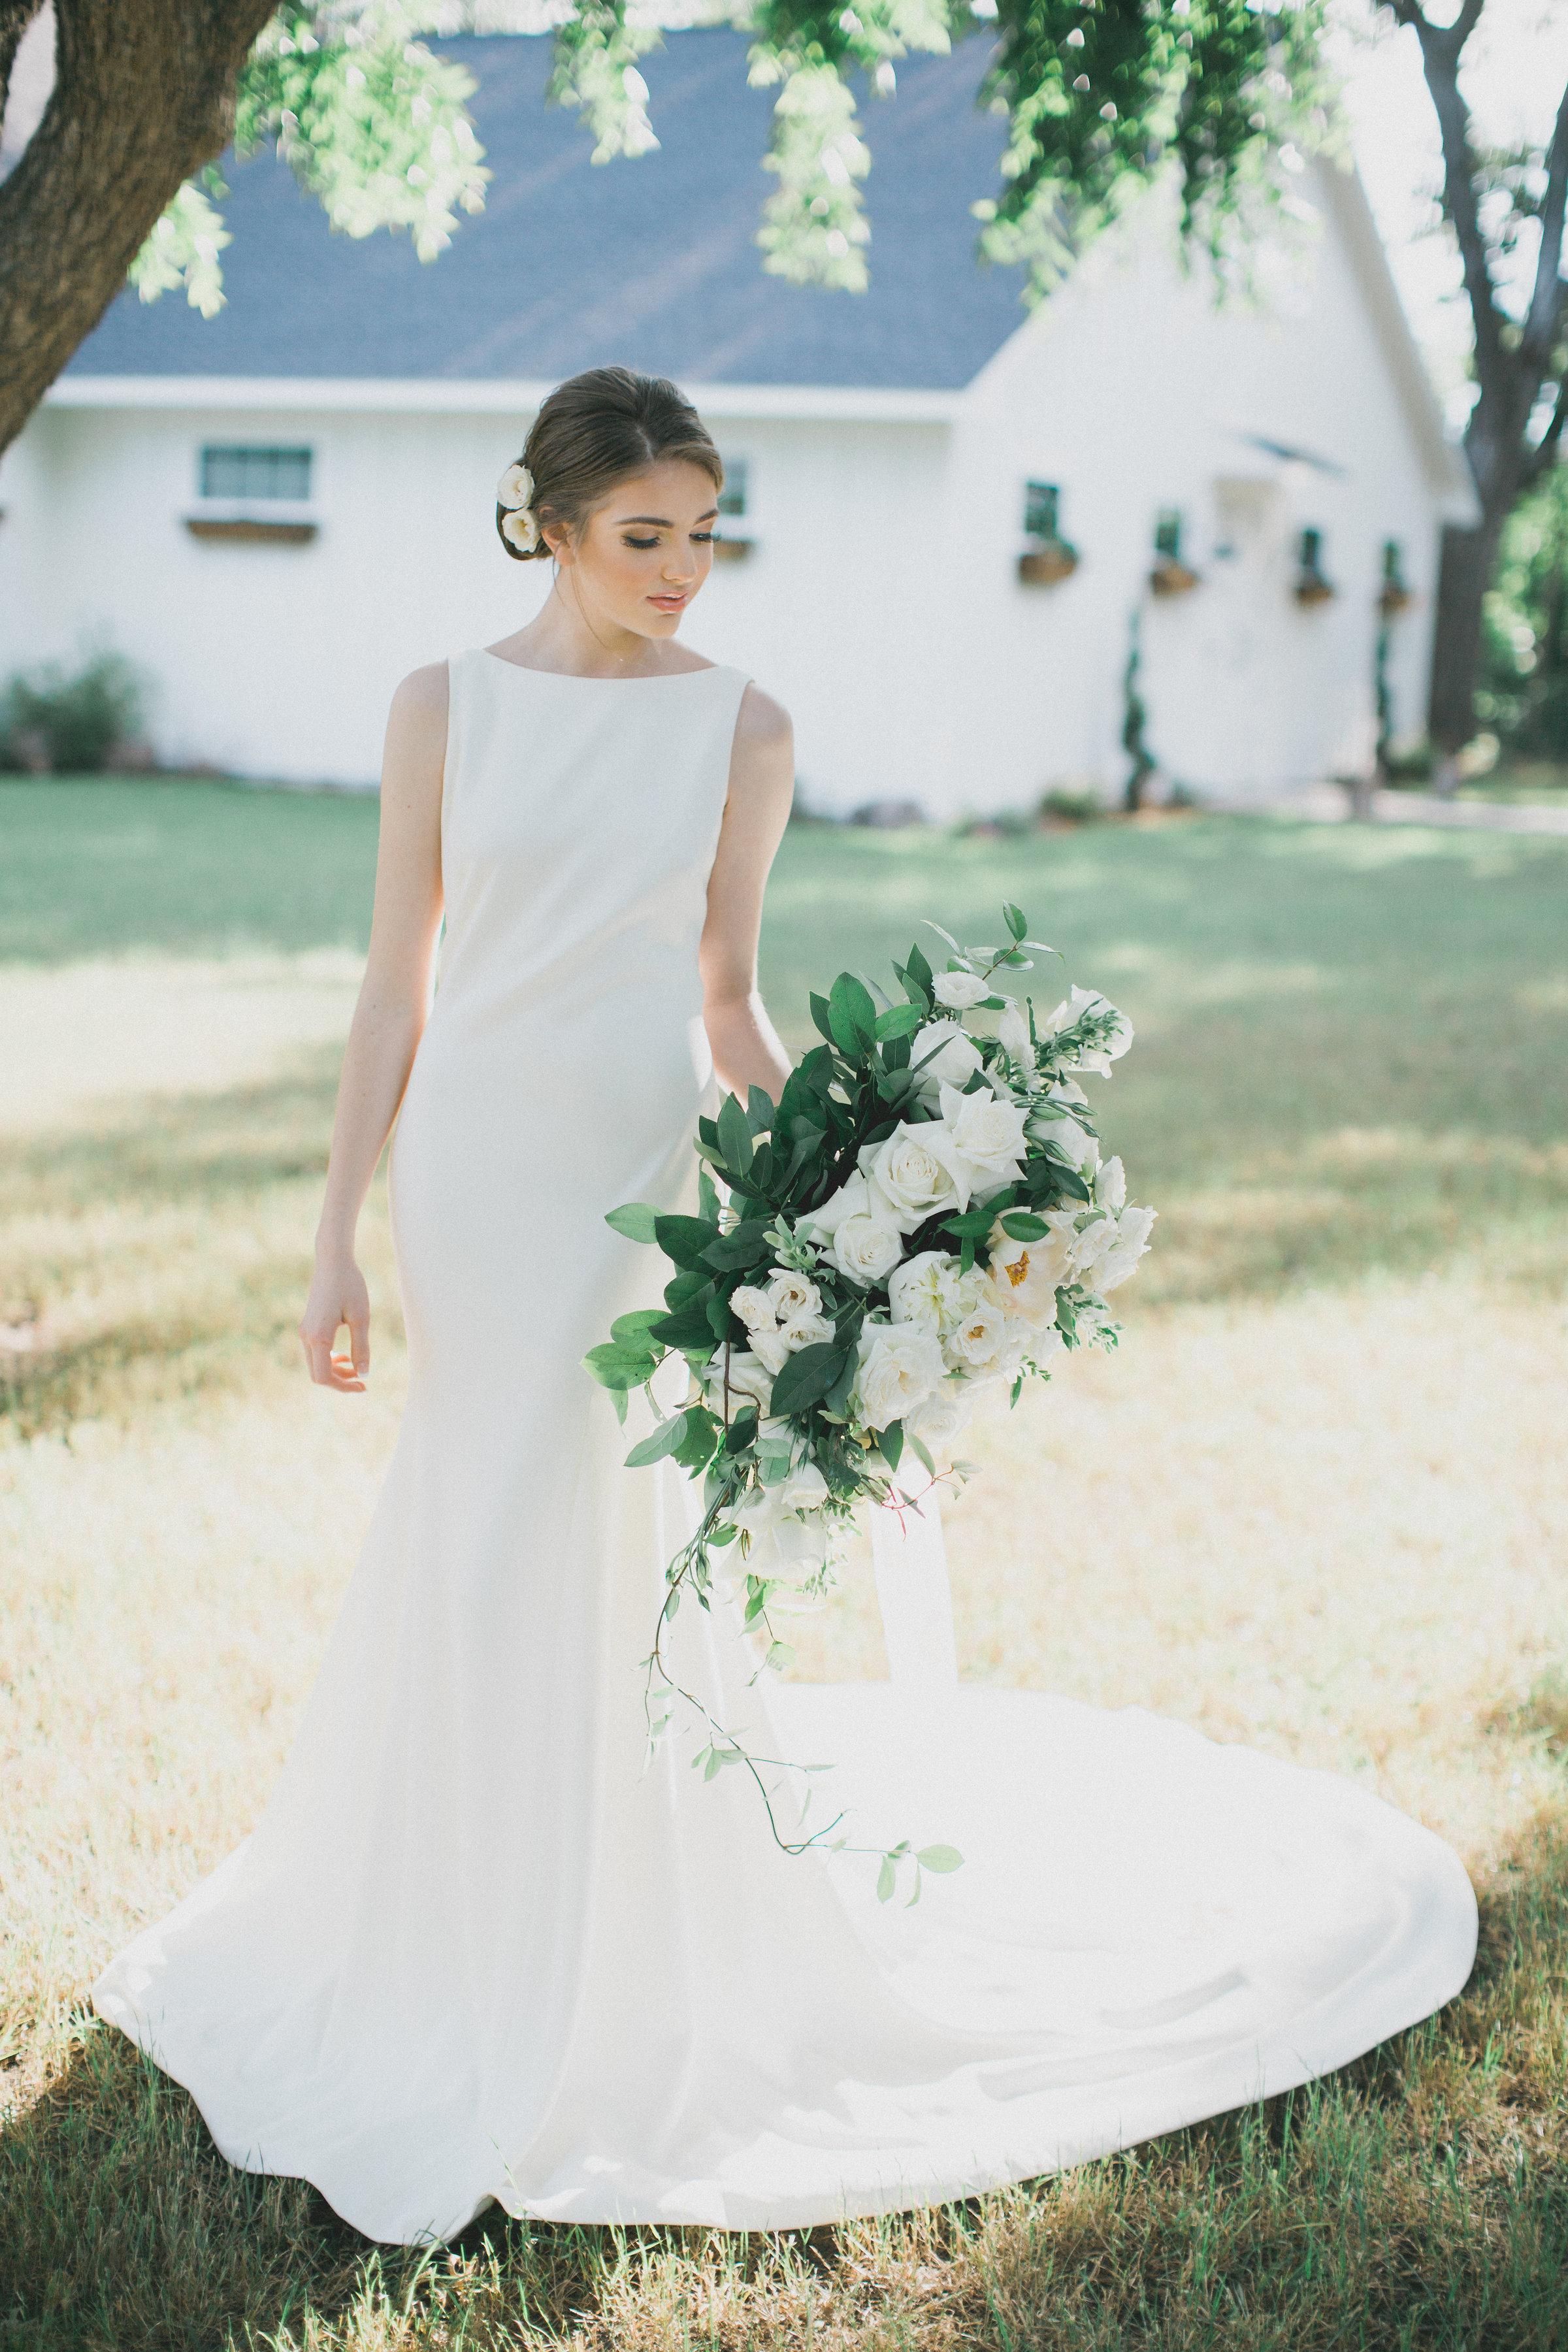 Bridal Portrait Inspiration | Southern Summer White Barn Wedding in Dallas, TX